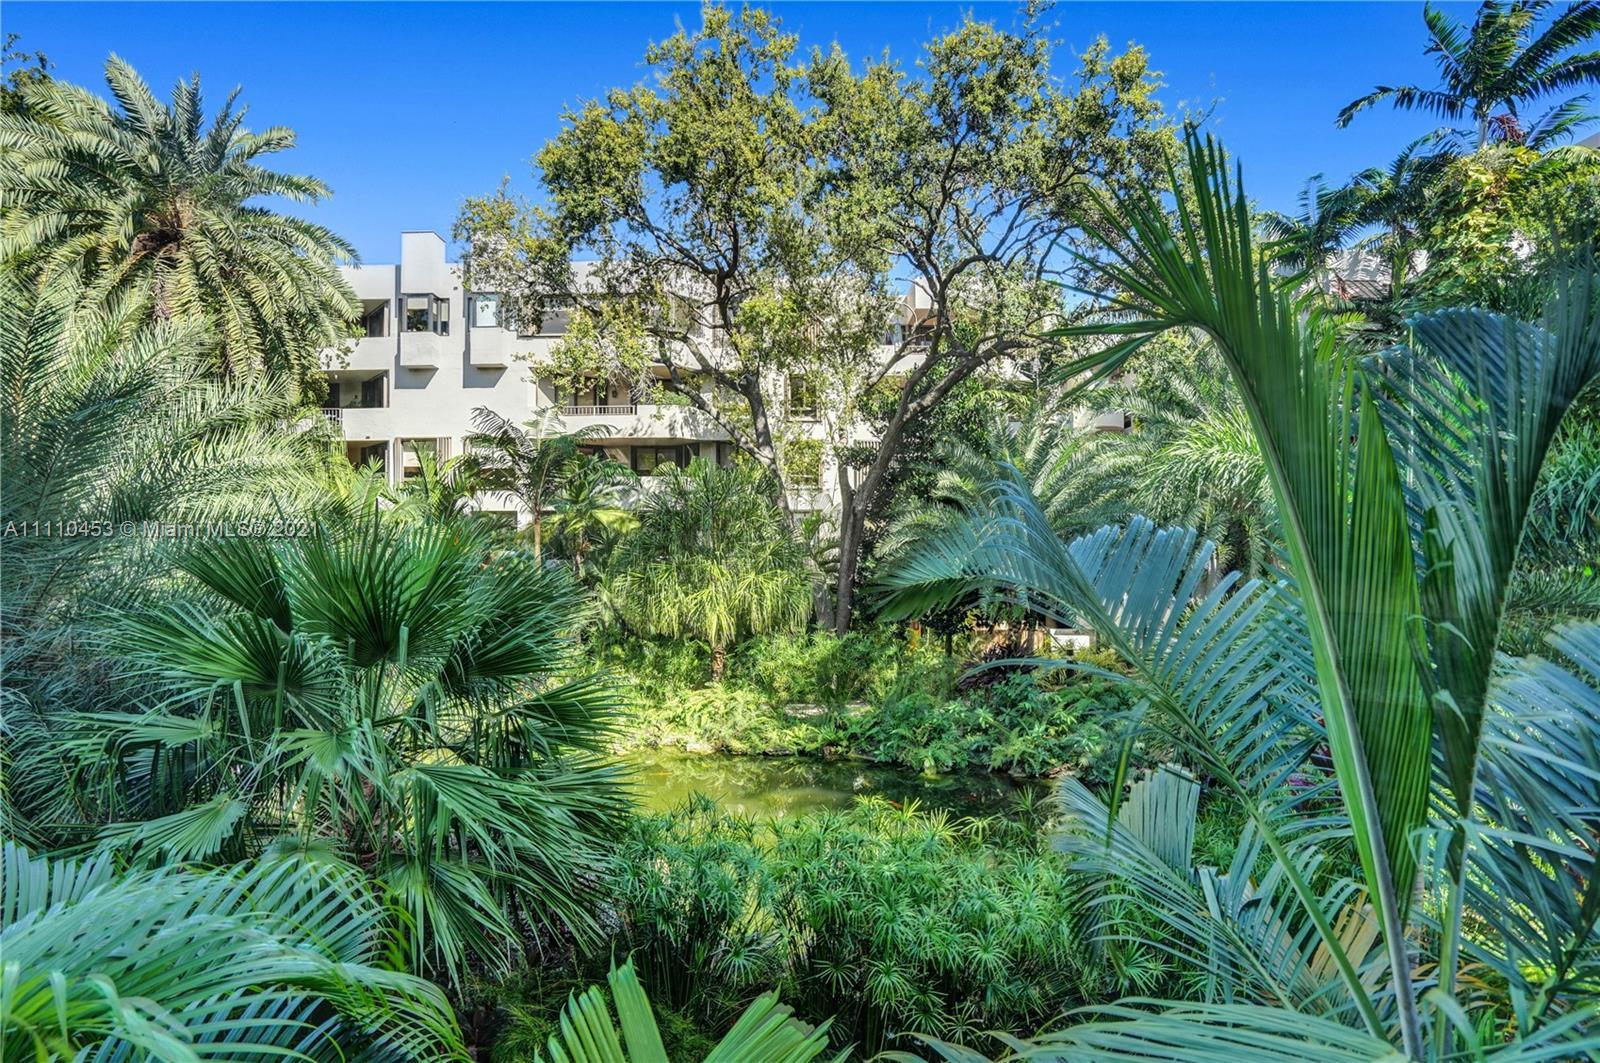 KEY COLONY NO 4 CONDO,Botanica Key Colony Condo,For Sale,KEY COLONY NO 4 CONDO,Botanica Key Colony Brickell,realty,broker,condos near me